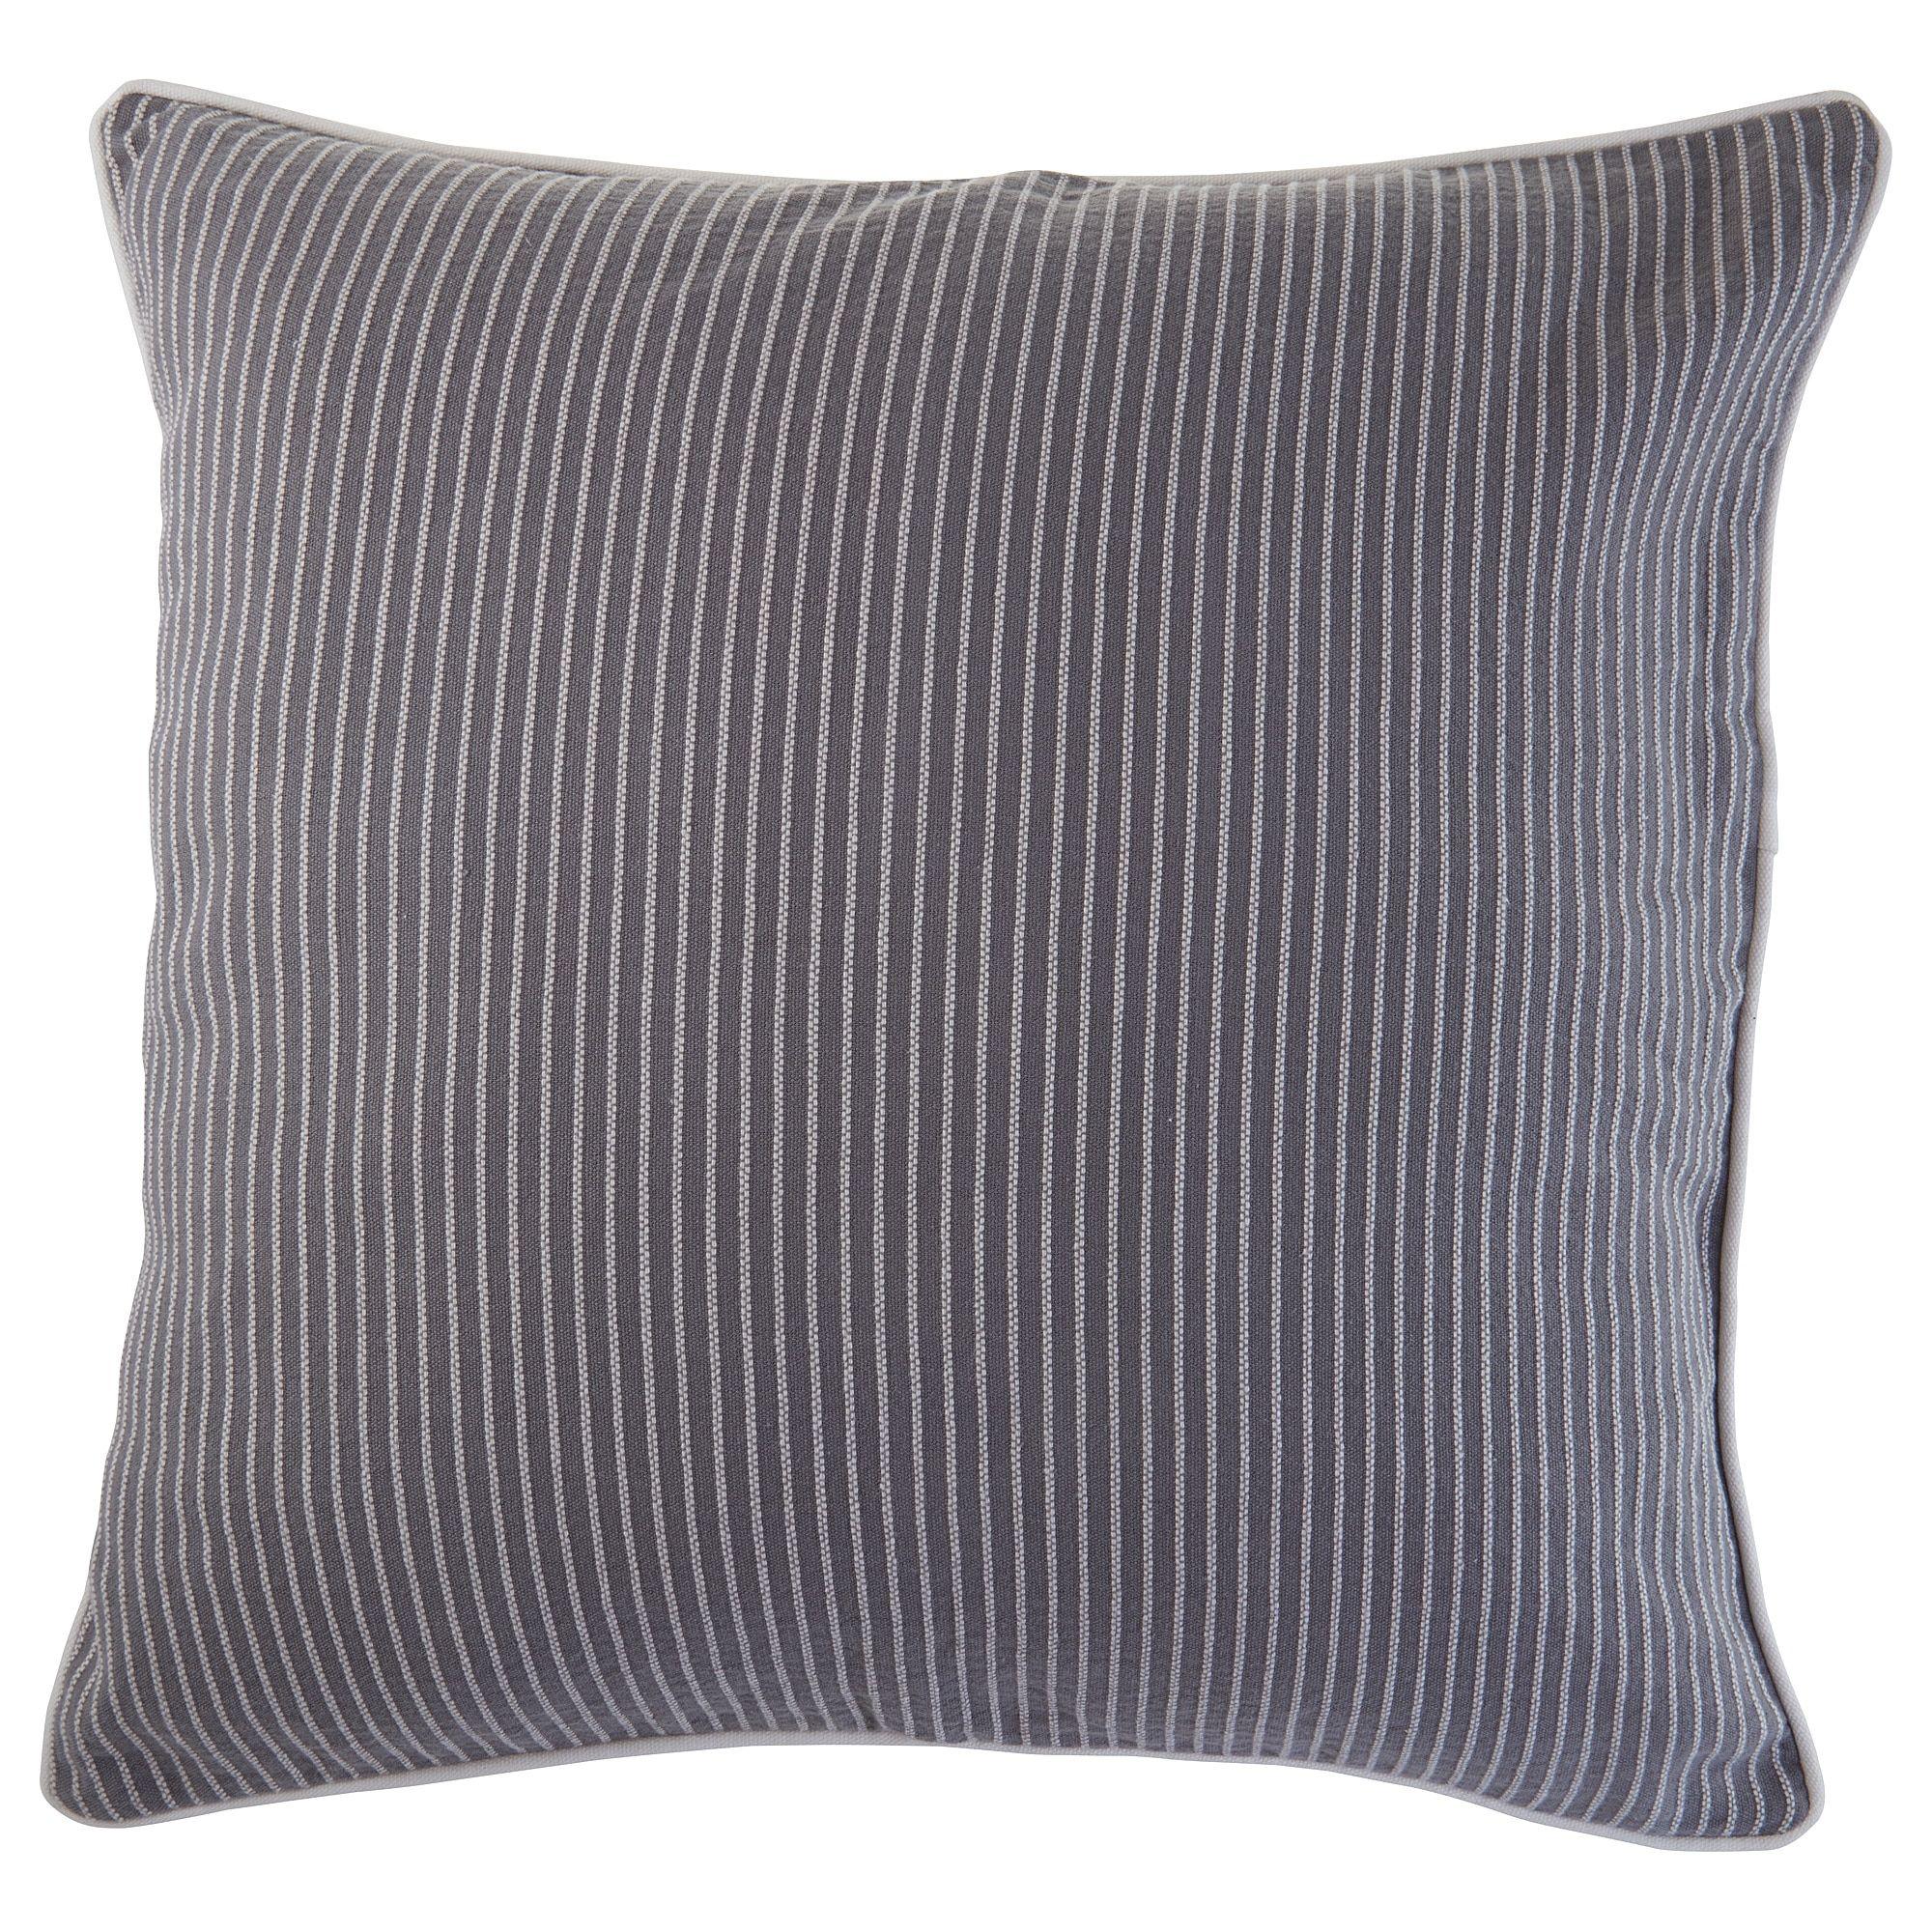 Flenangsfly Kissenbezug Grau In 2019 Pillows Ikea Throw Pillows